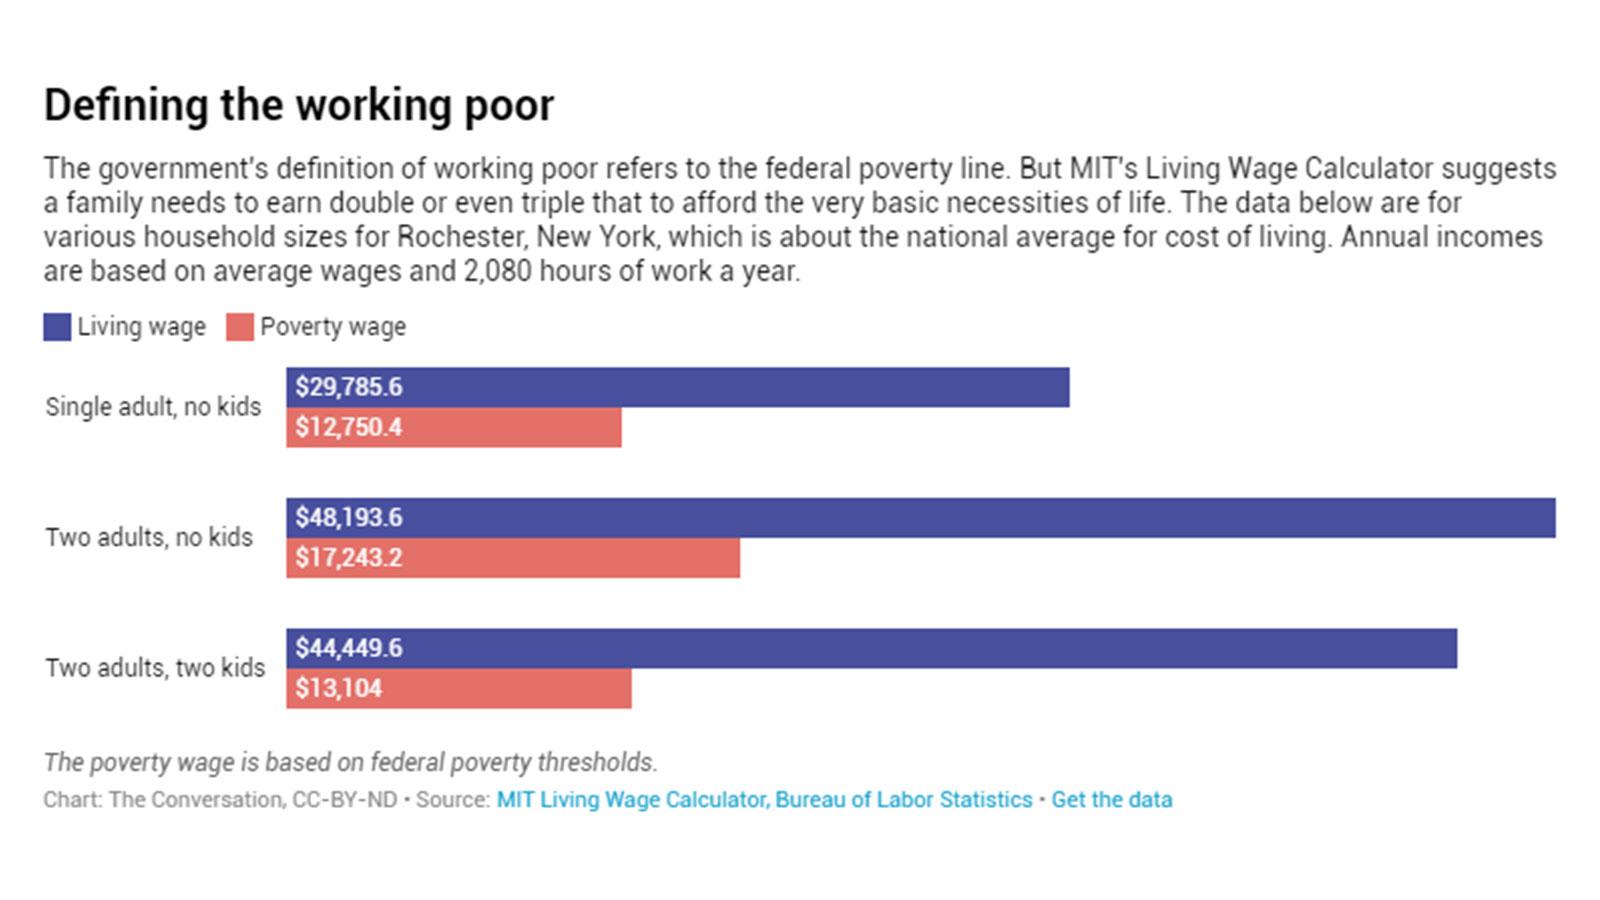 Defining the working poor